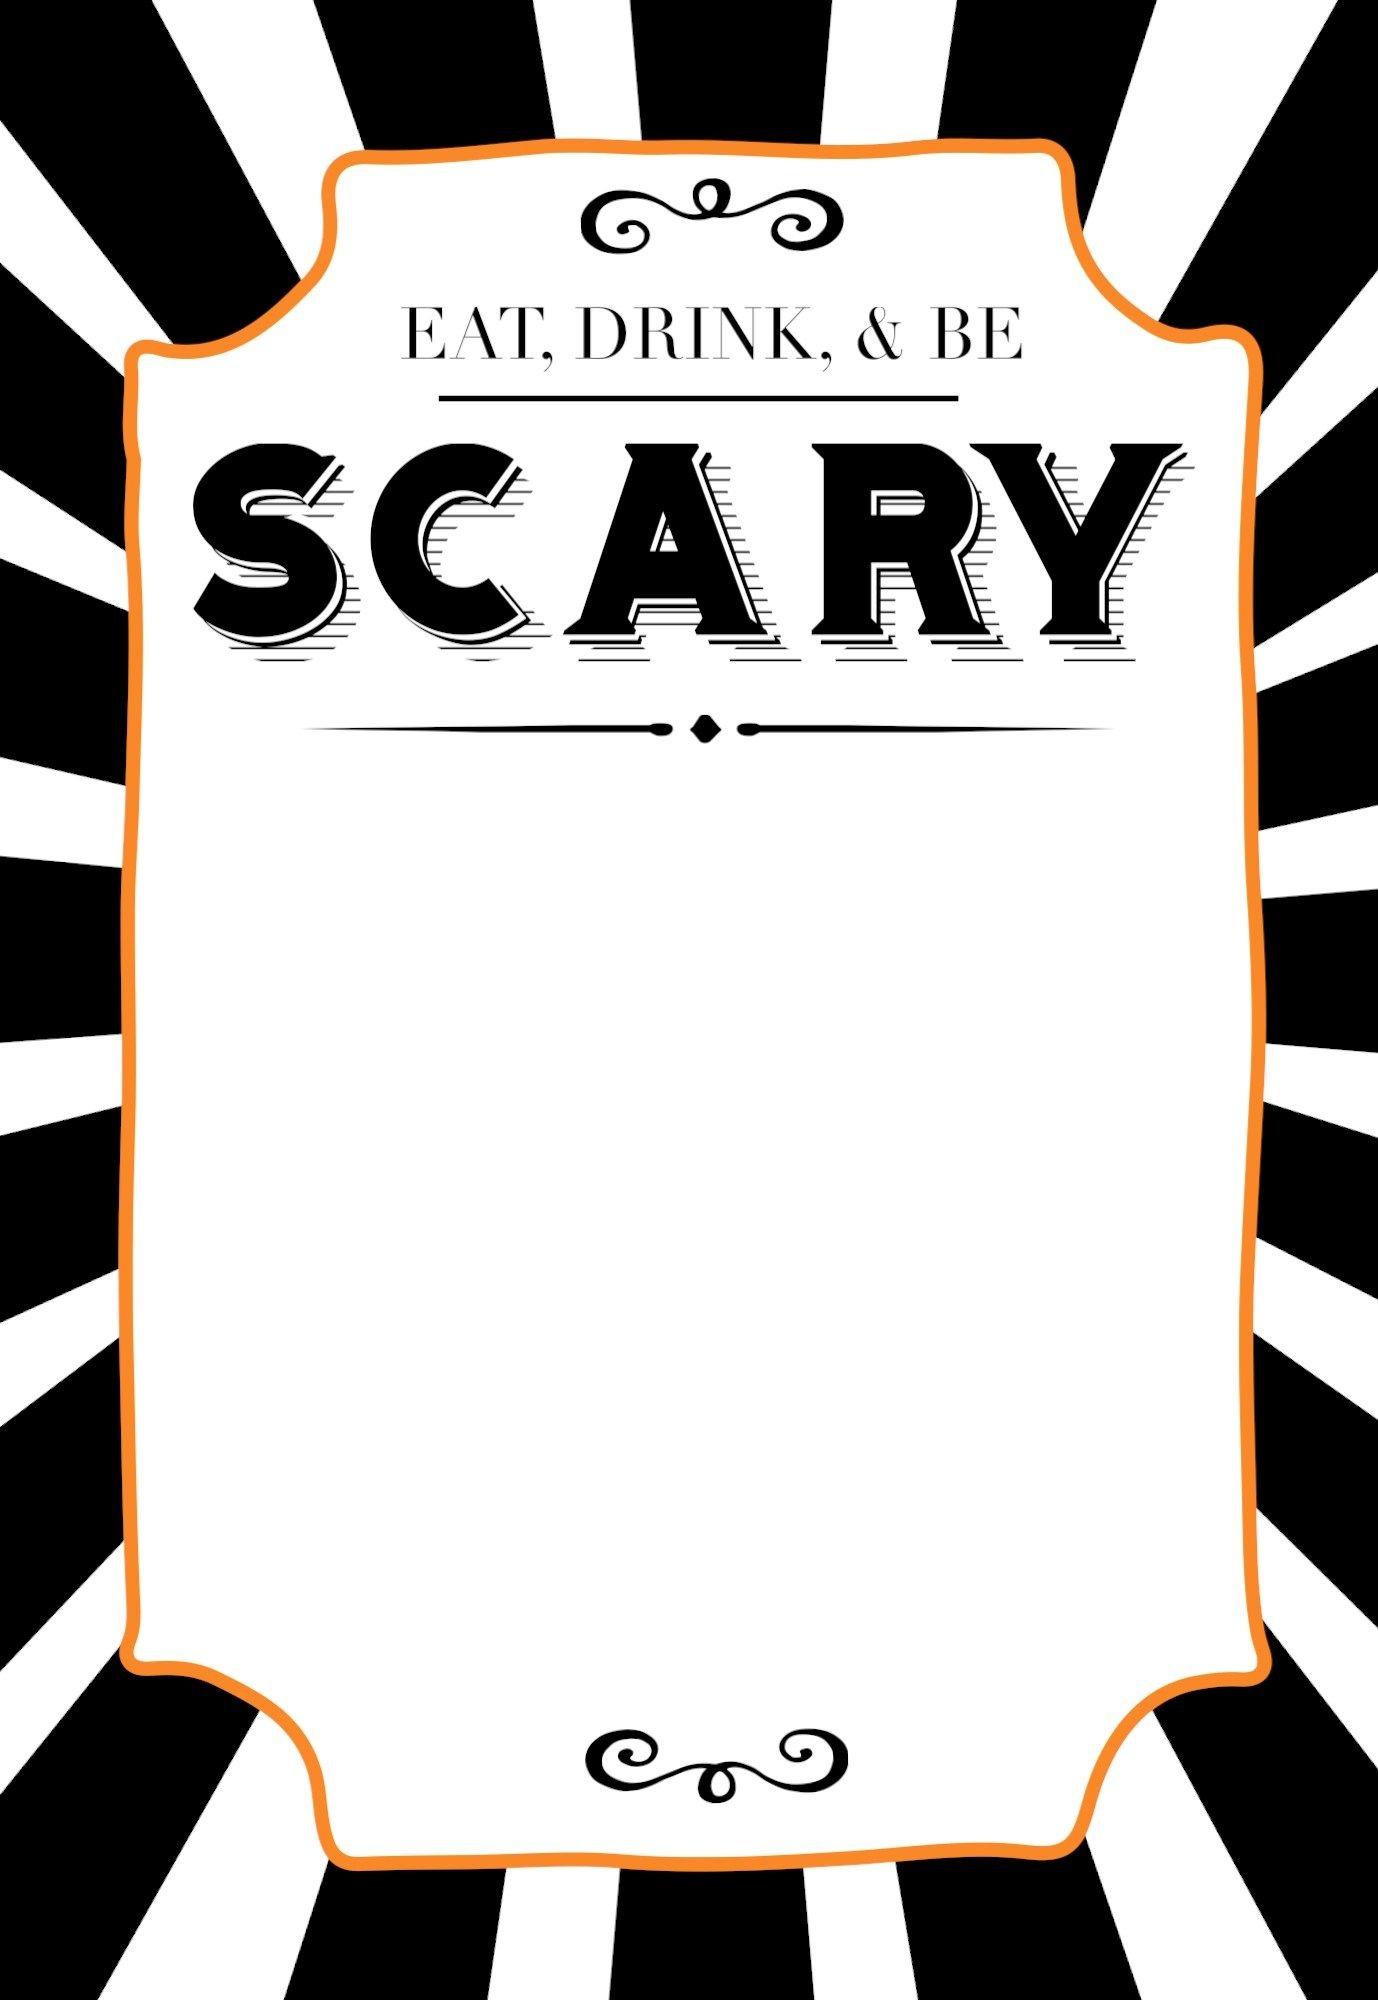 Halloween Invitations Free Printable Template | Yw | Halloween - Free Printable Halloween Invitations